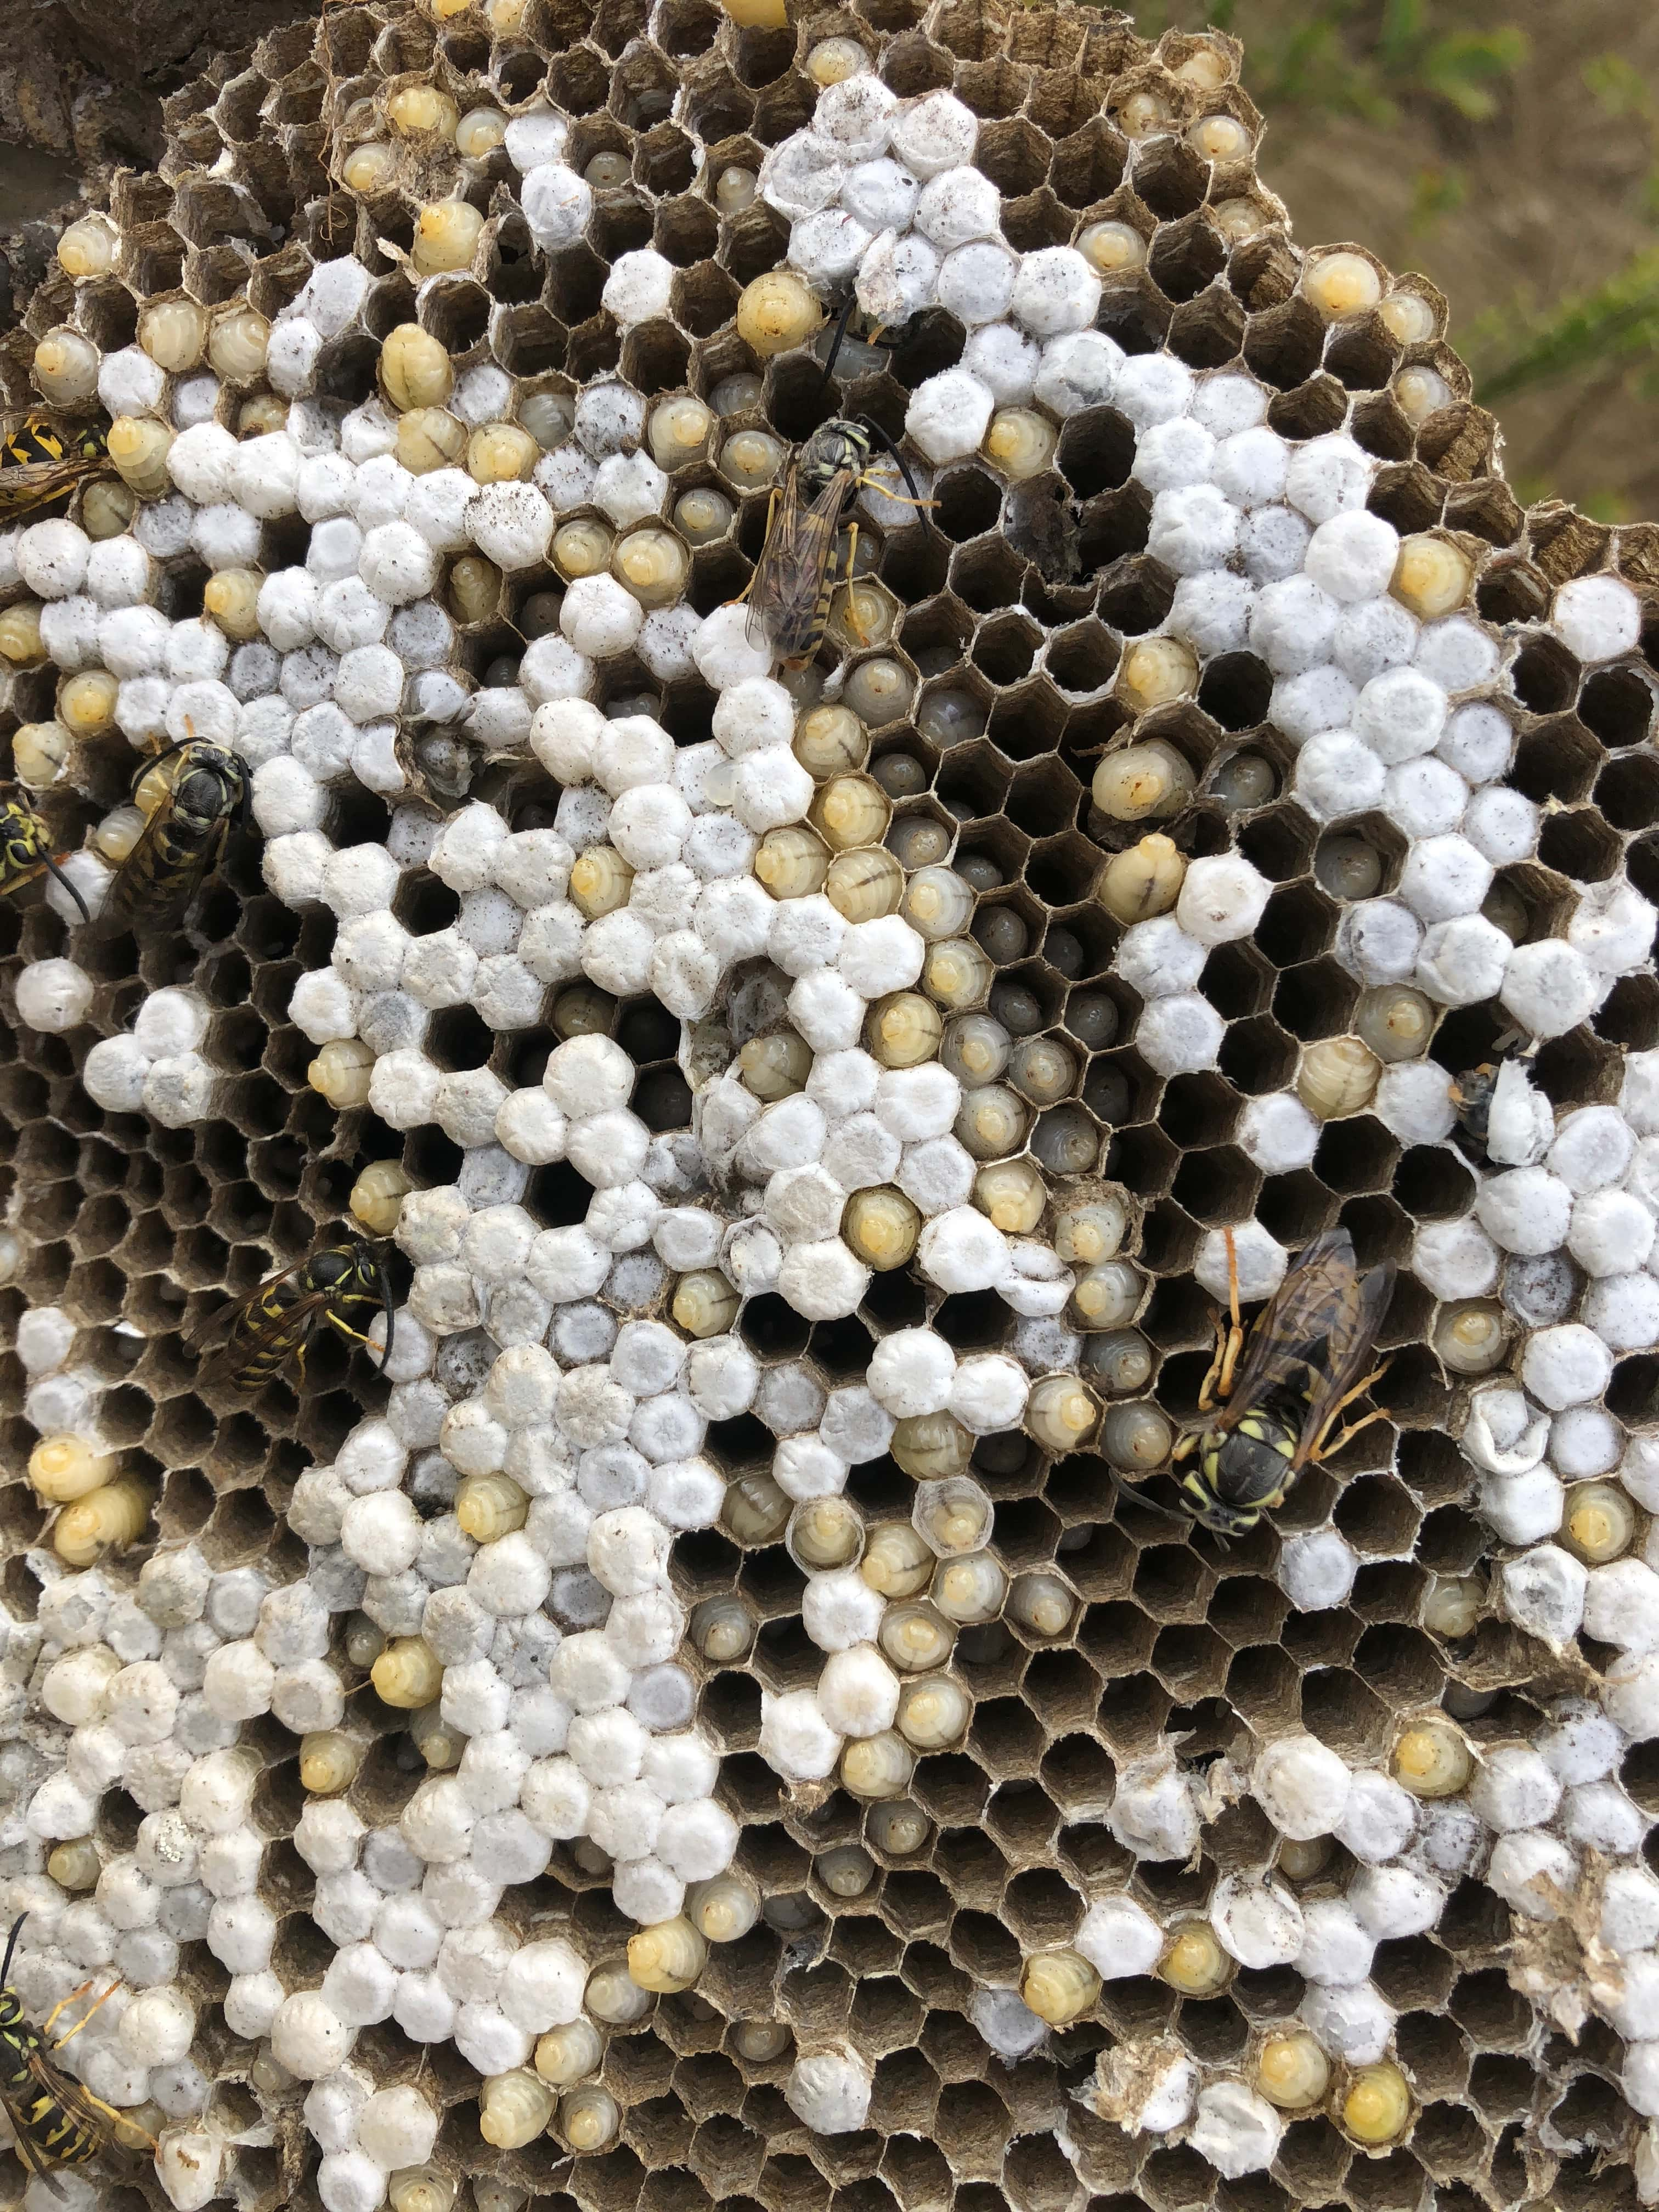 Cascadia Venom Collection yellowjacket nest removal